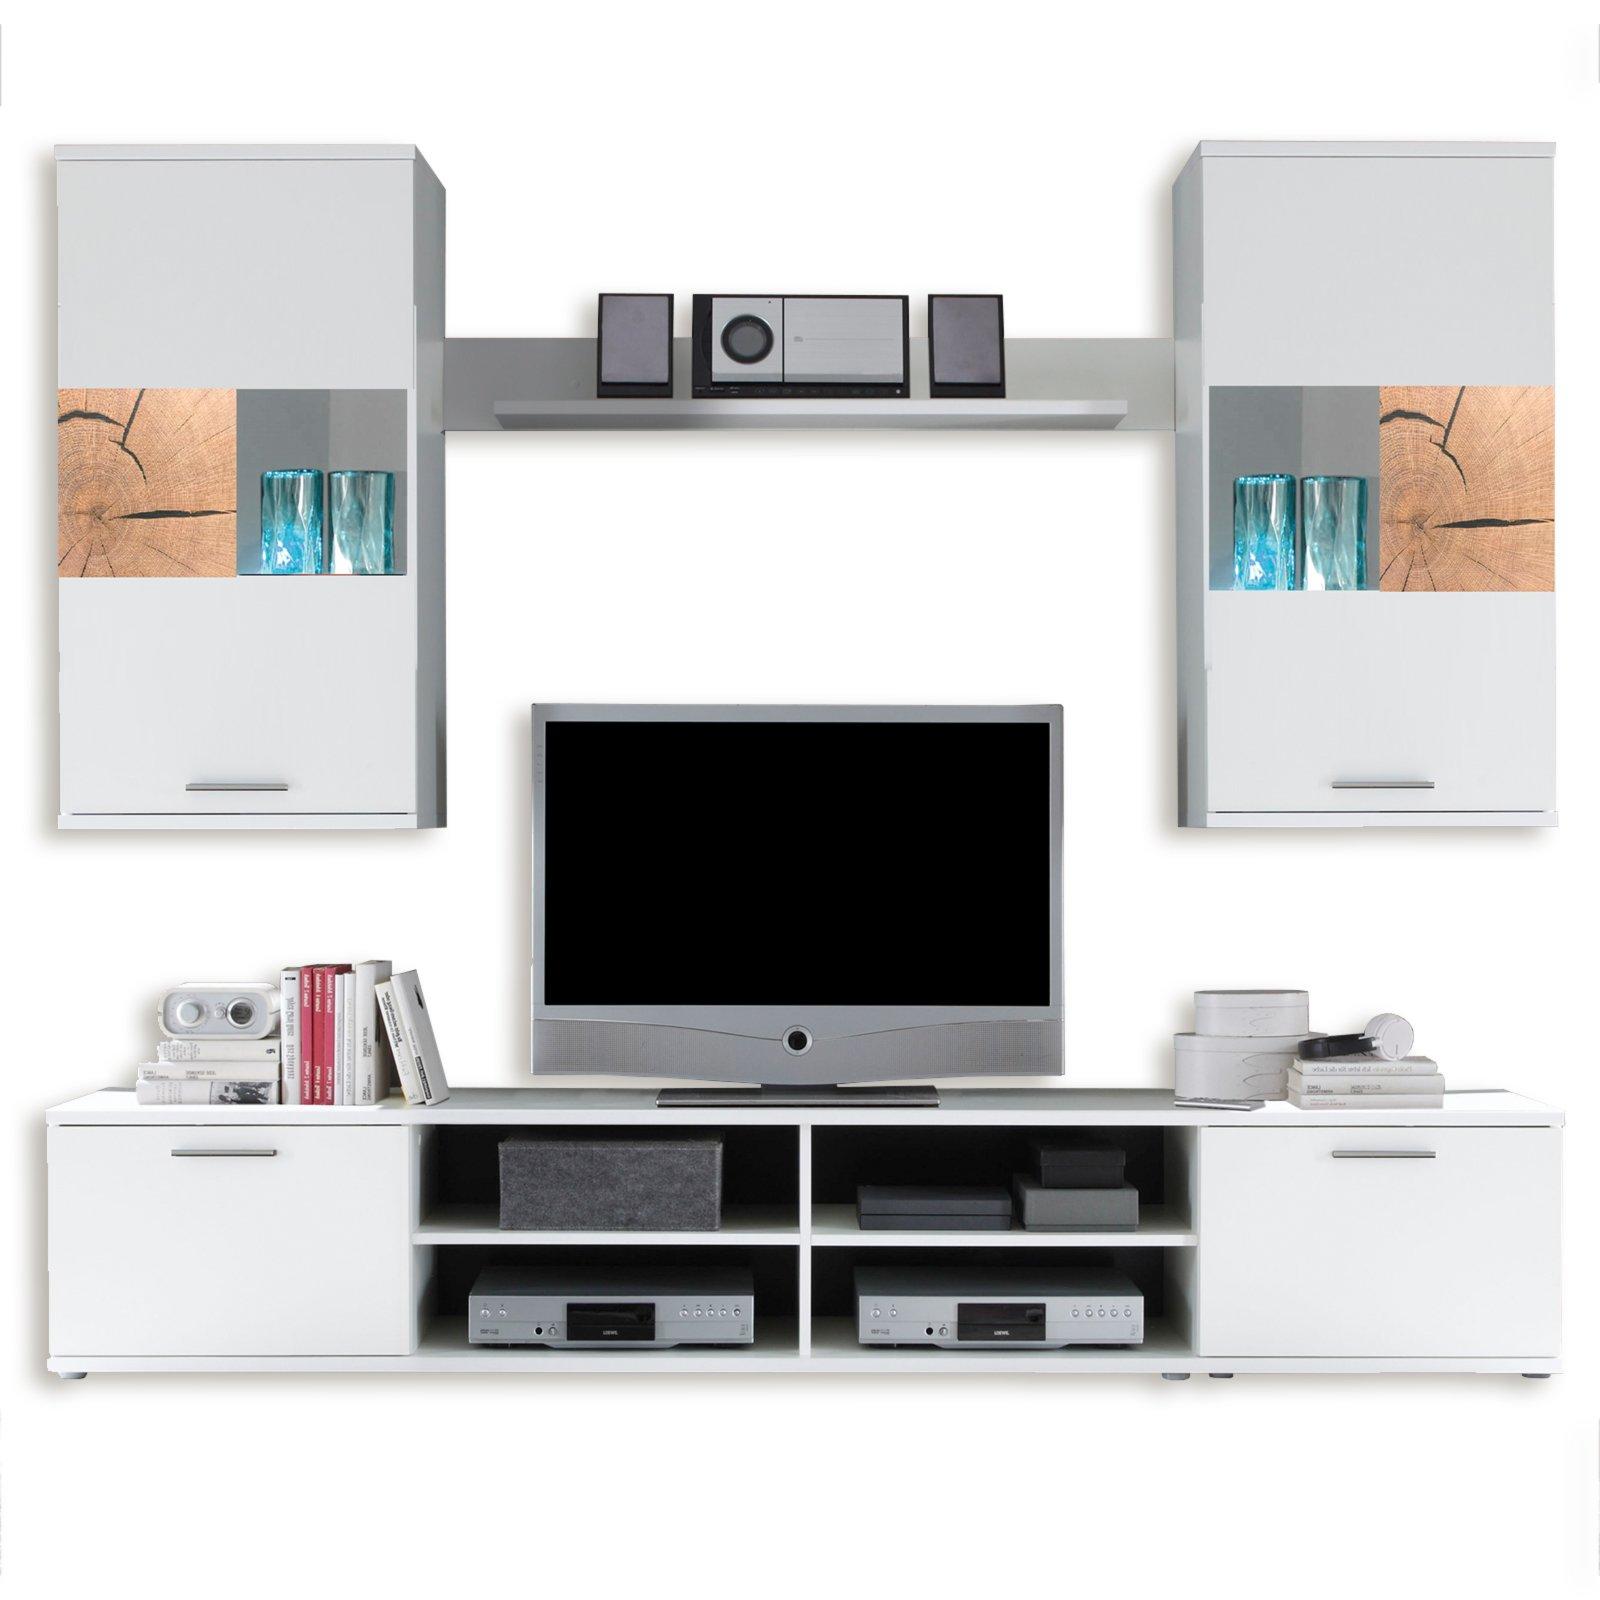 wohnwand spalt wei mit led beleuchtung wohnw nde. Black Bedroom Furniture Sets. Home Design Ideas